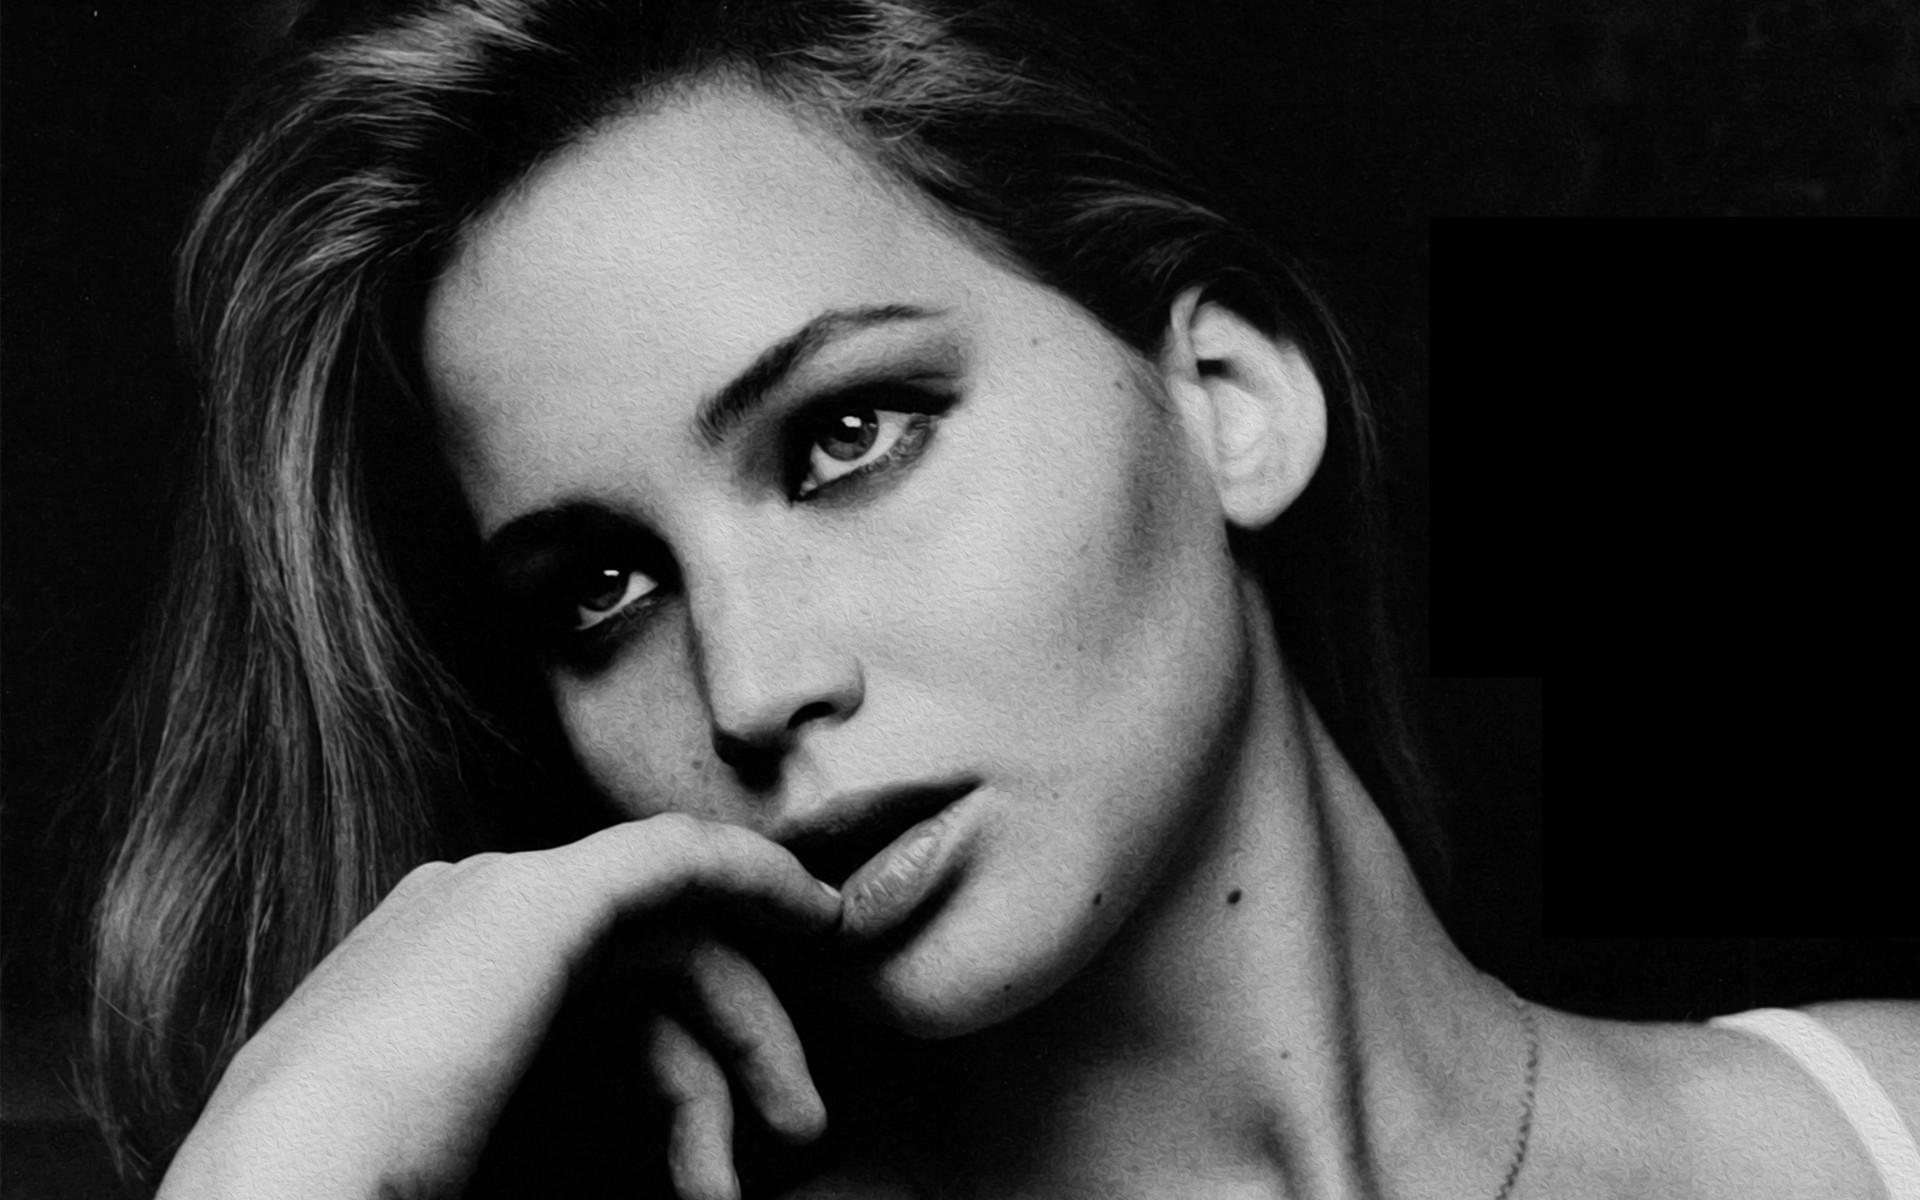 Jennifer Lawrence Actress 4 Cool Wallpapers HD